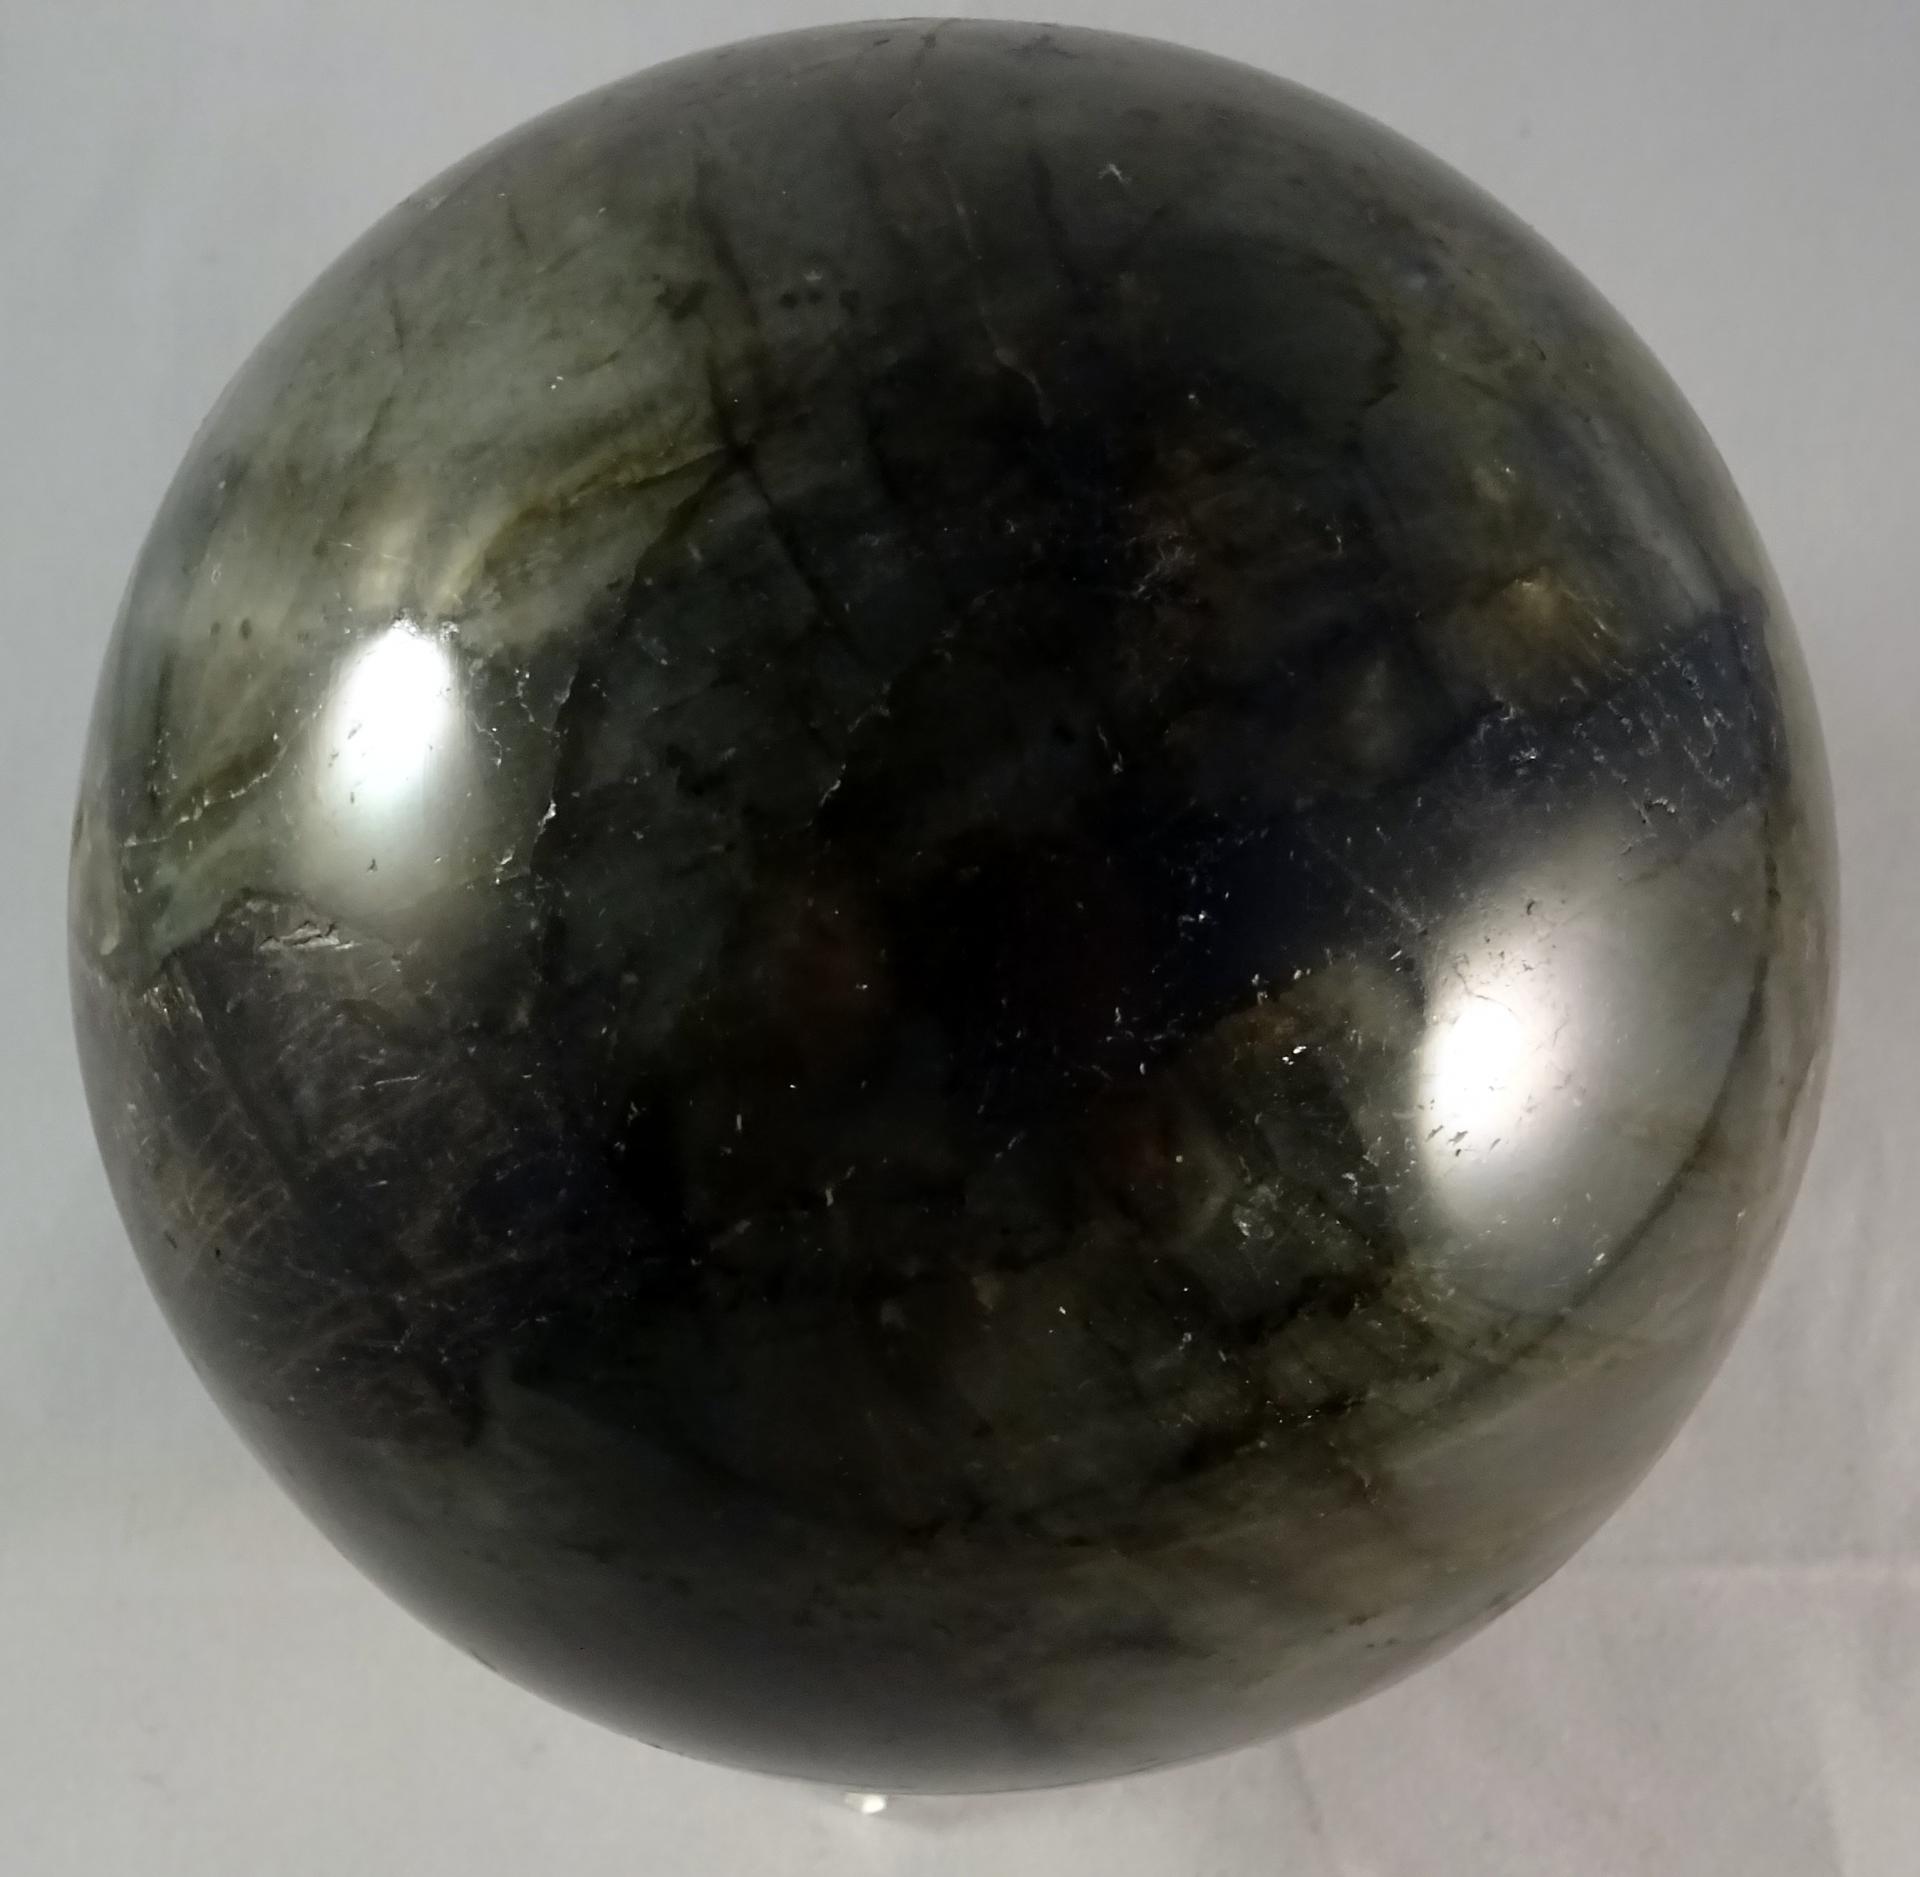 Spherelabra184